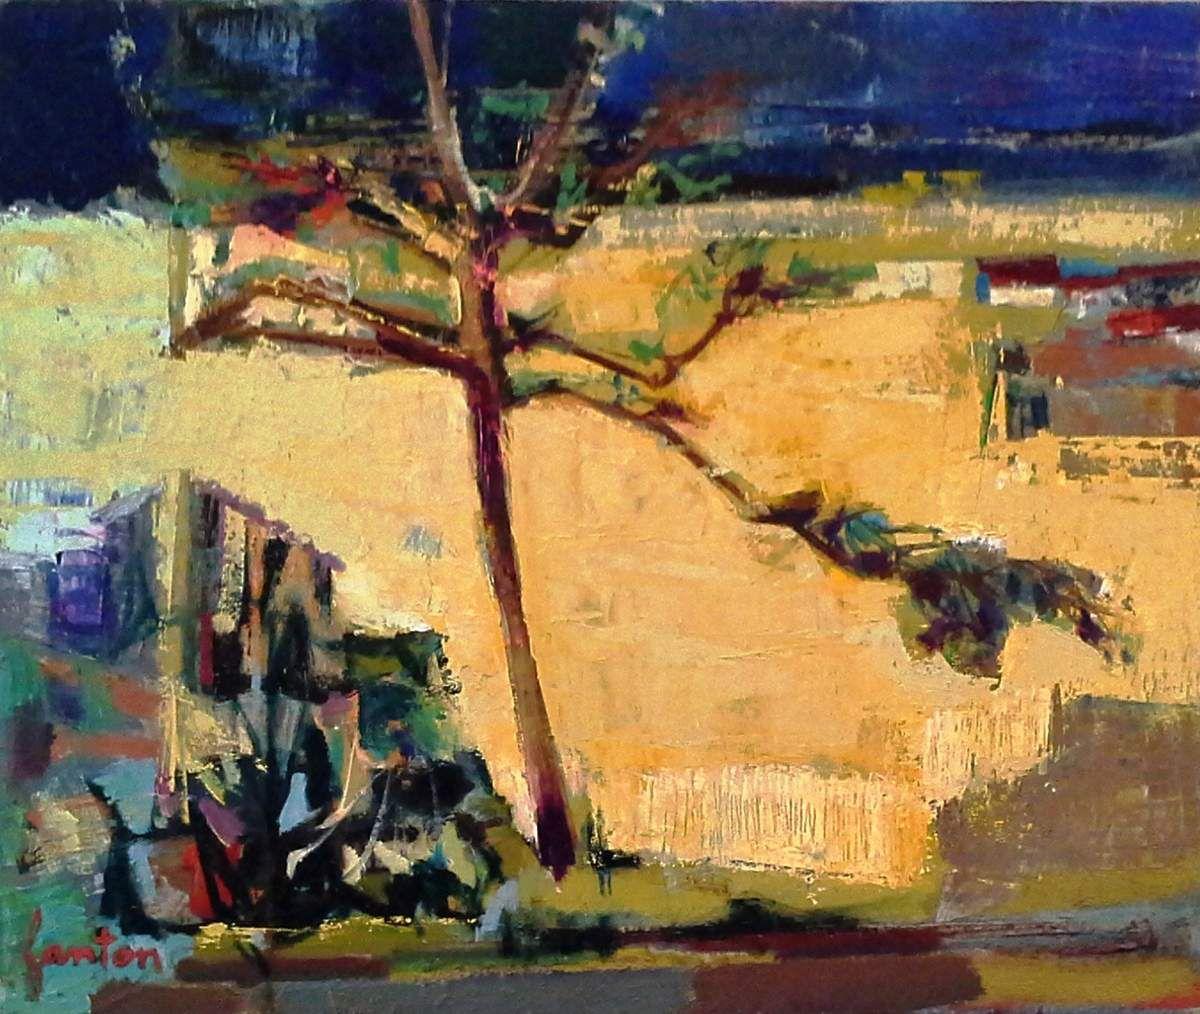 Robert Fanton, peintre 1919 - 2000